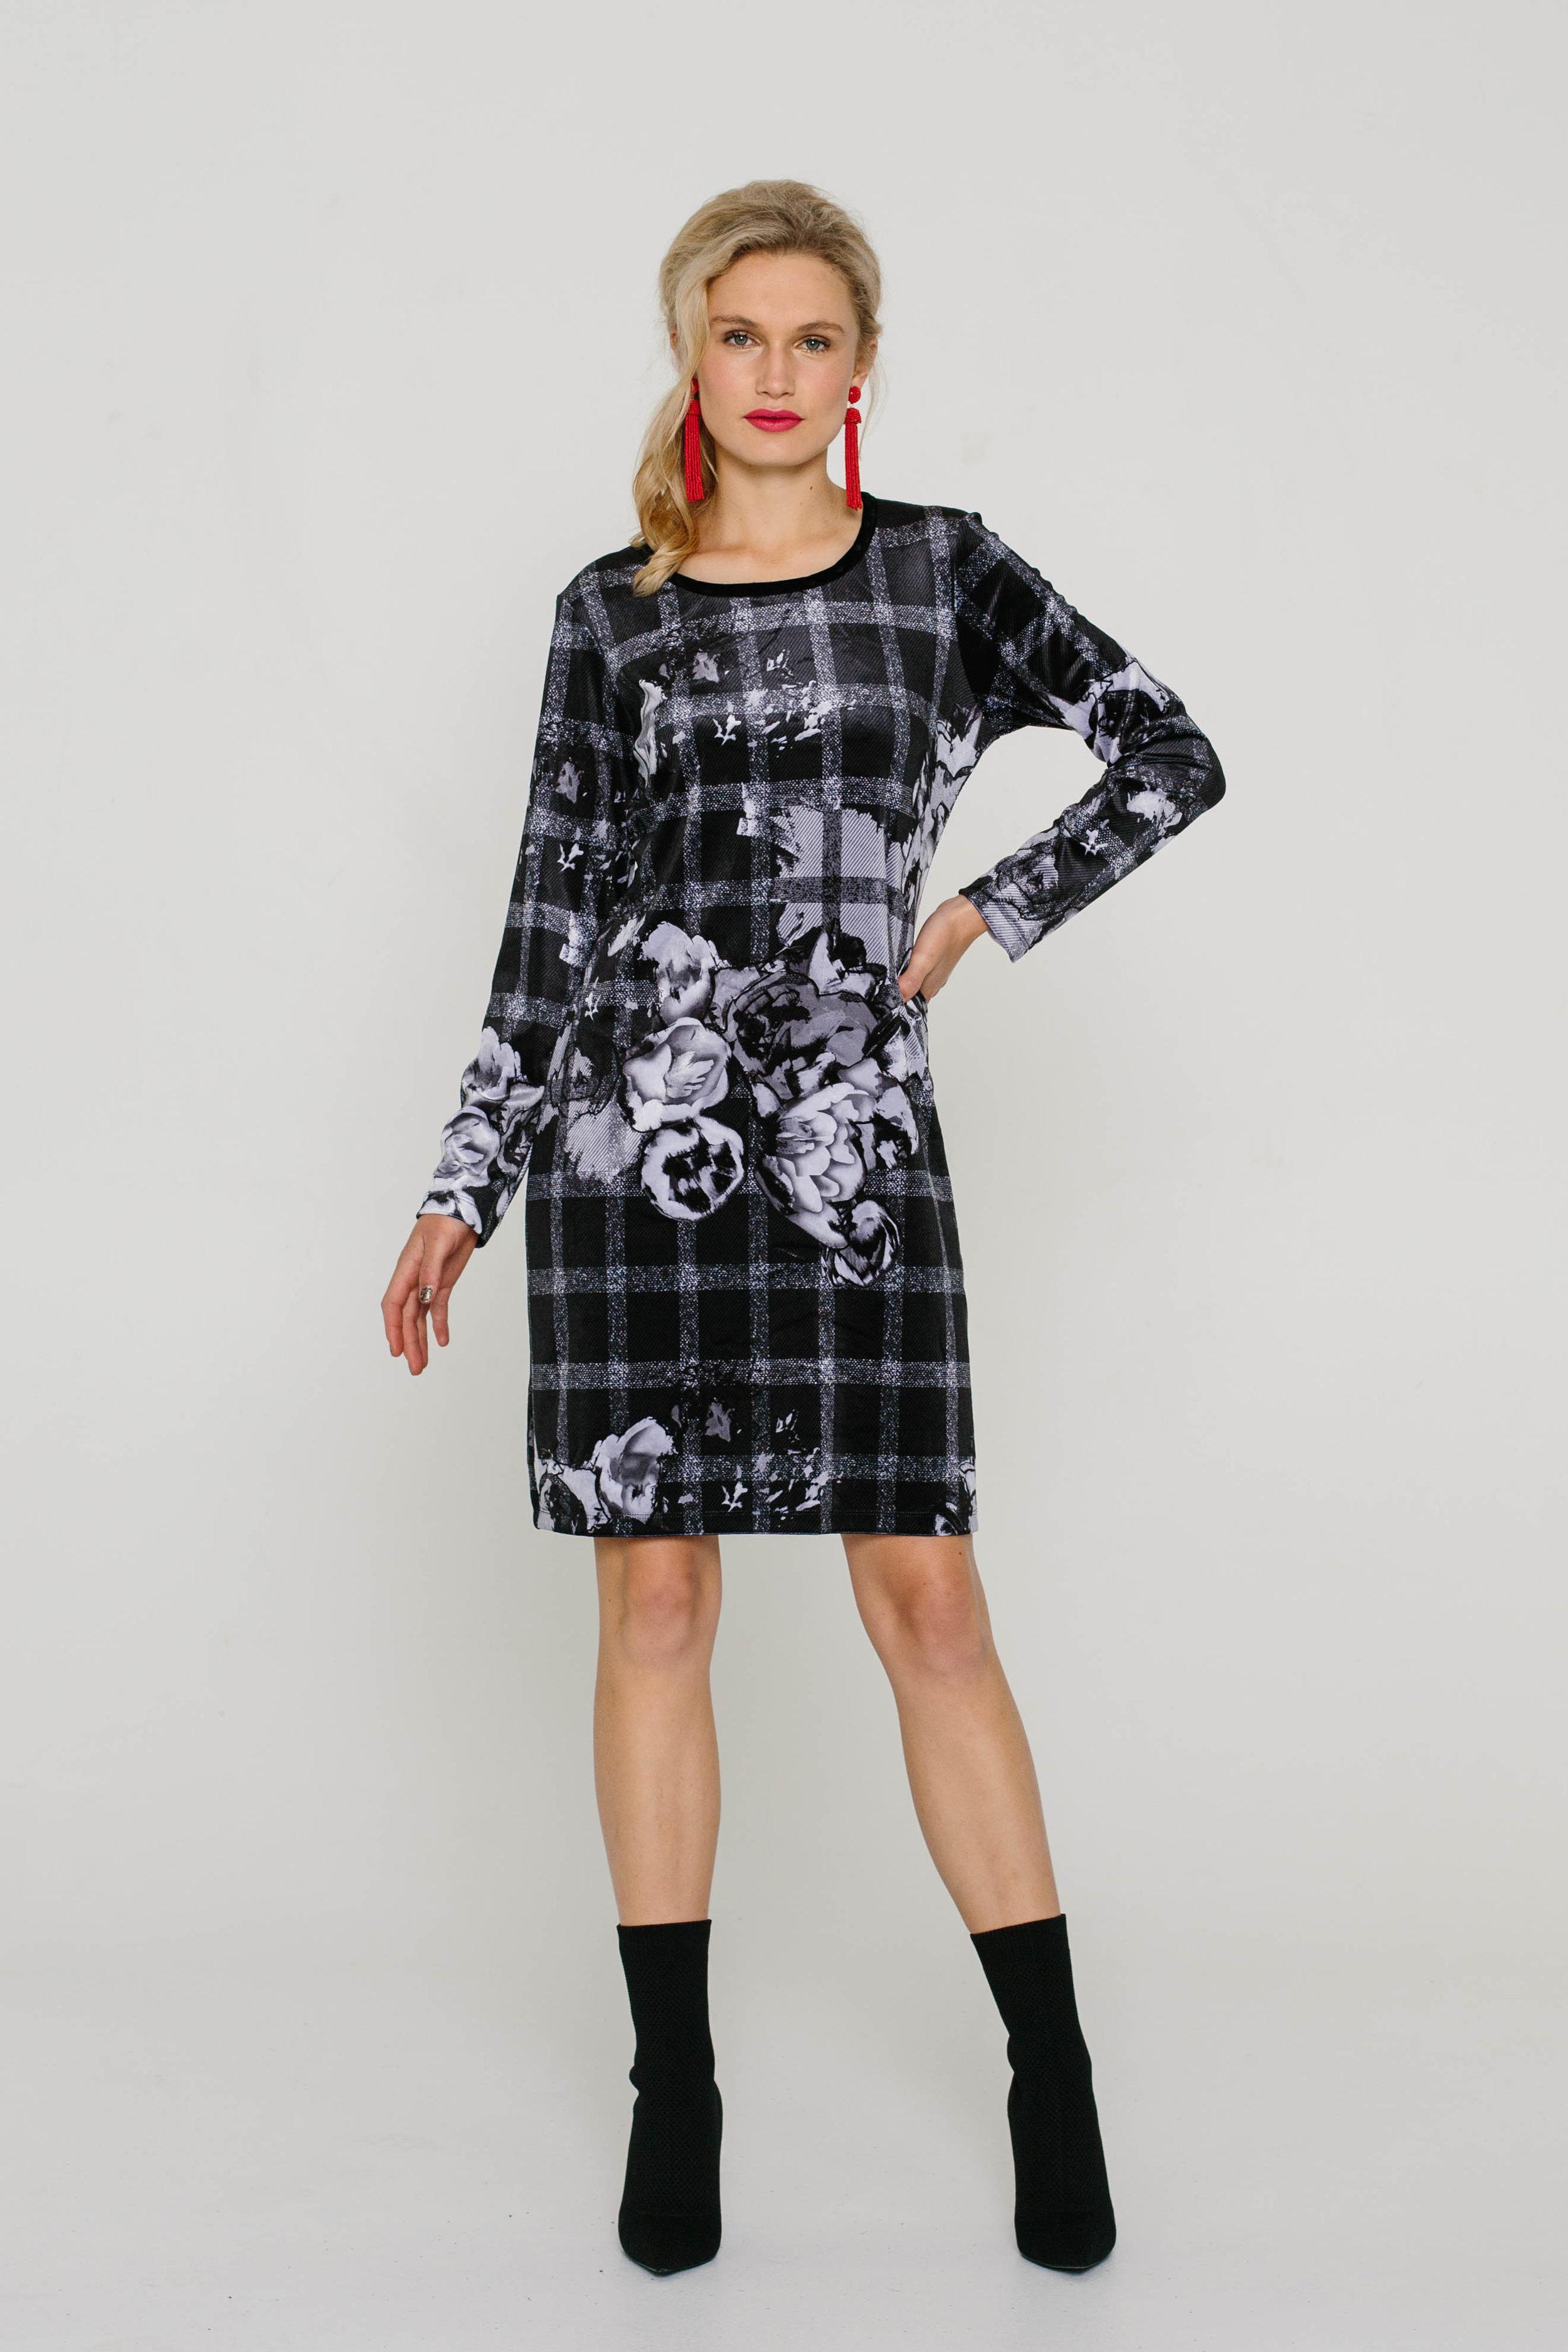 5979W Blondie Dress Check Black Rose